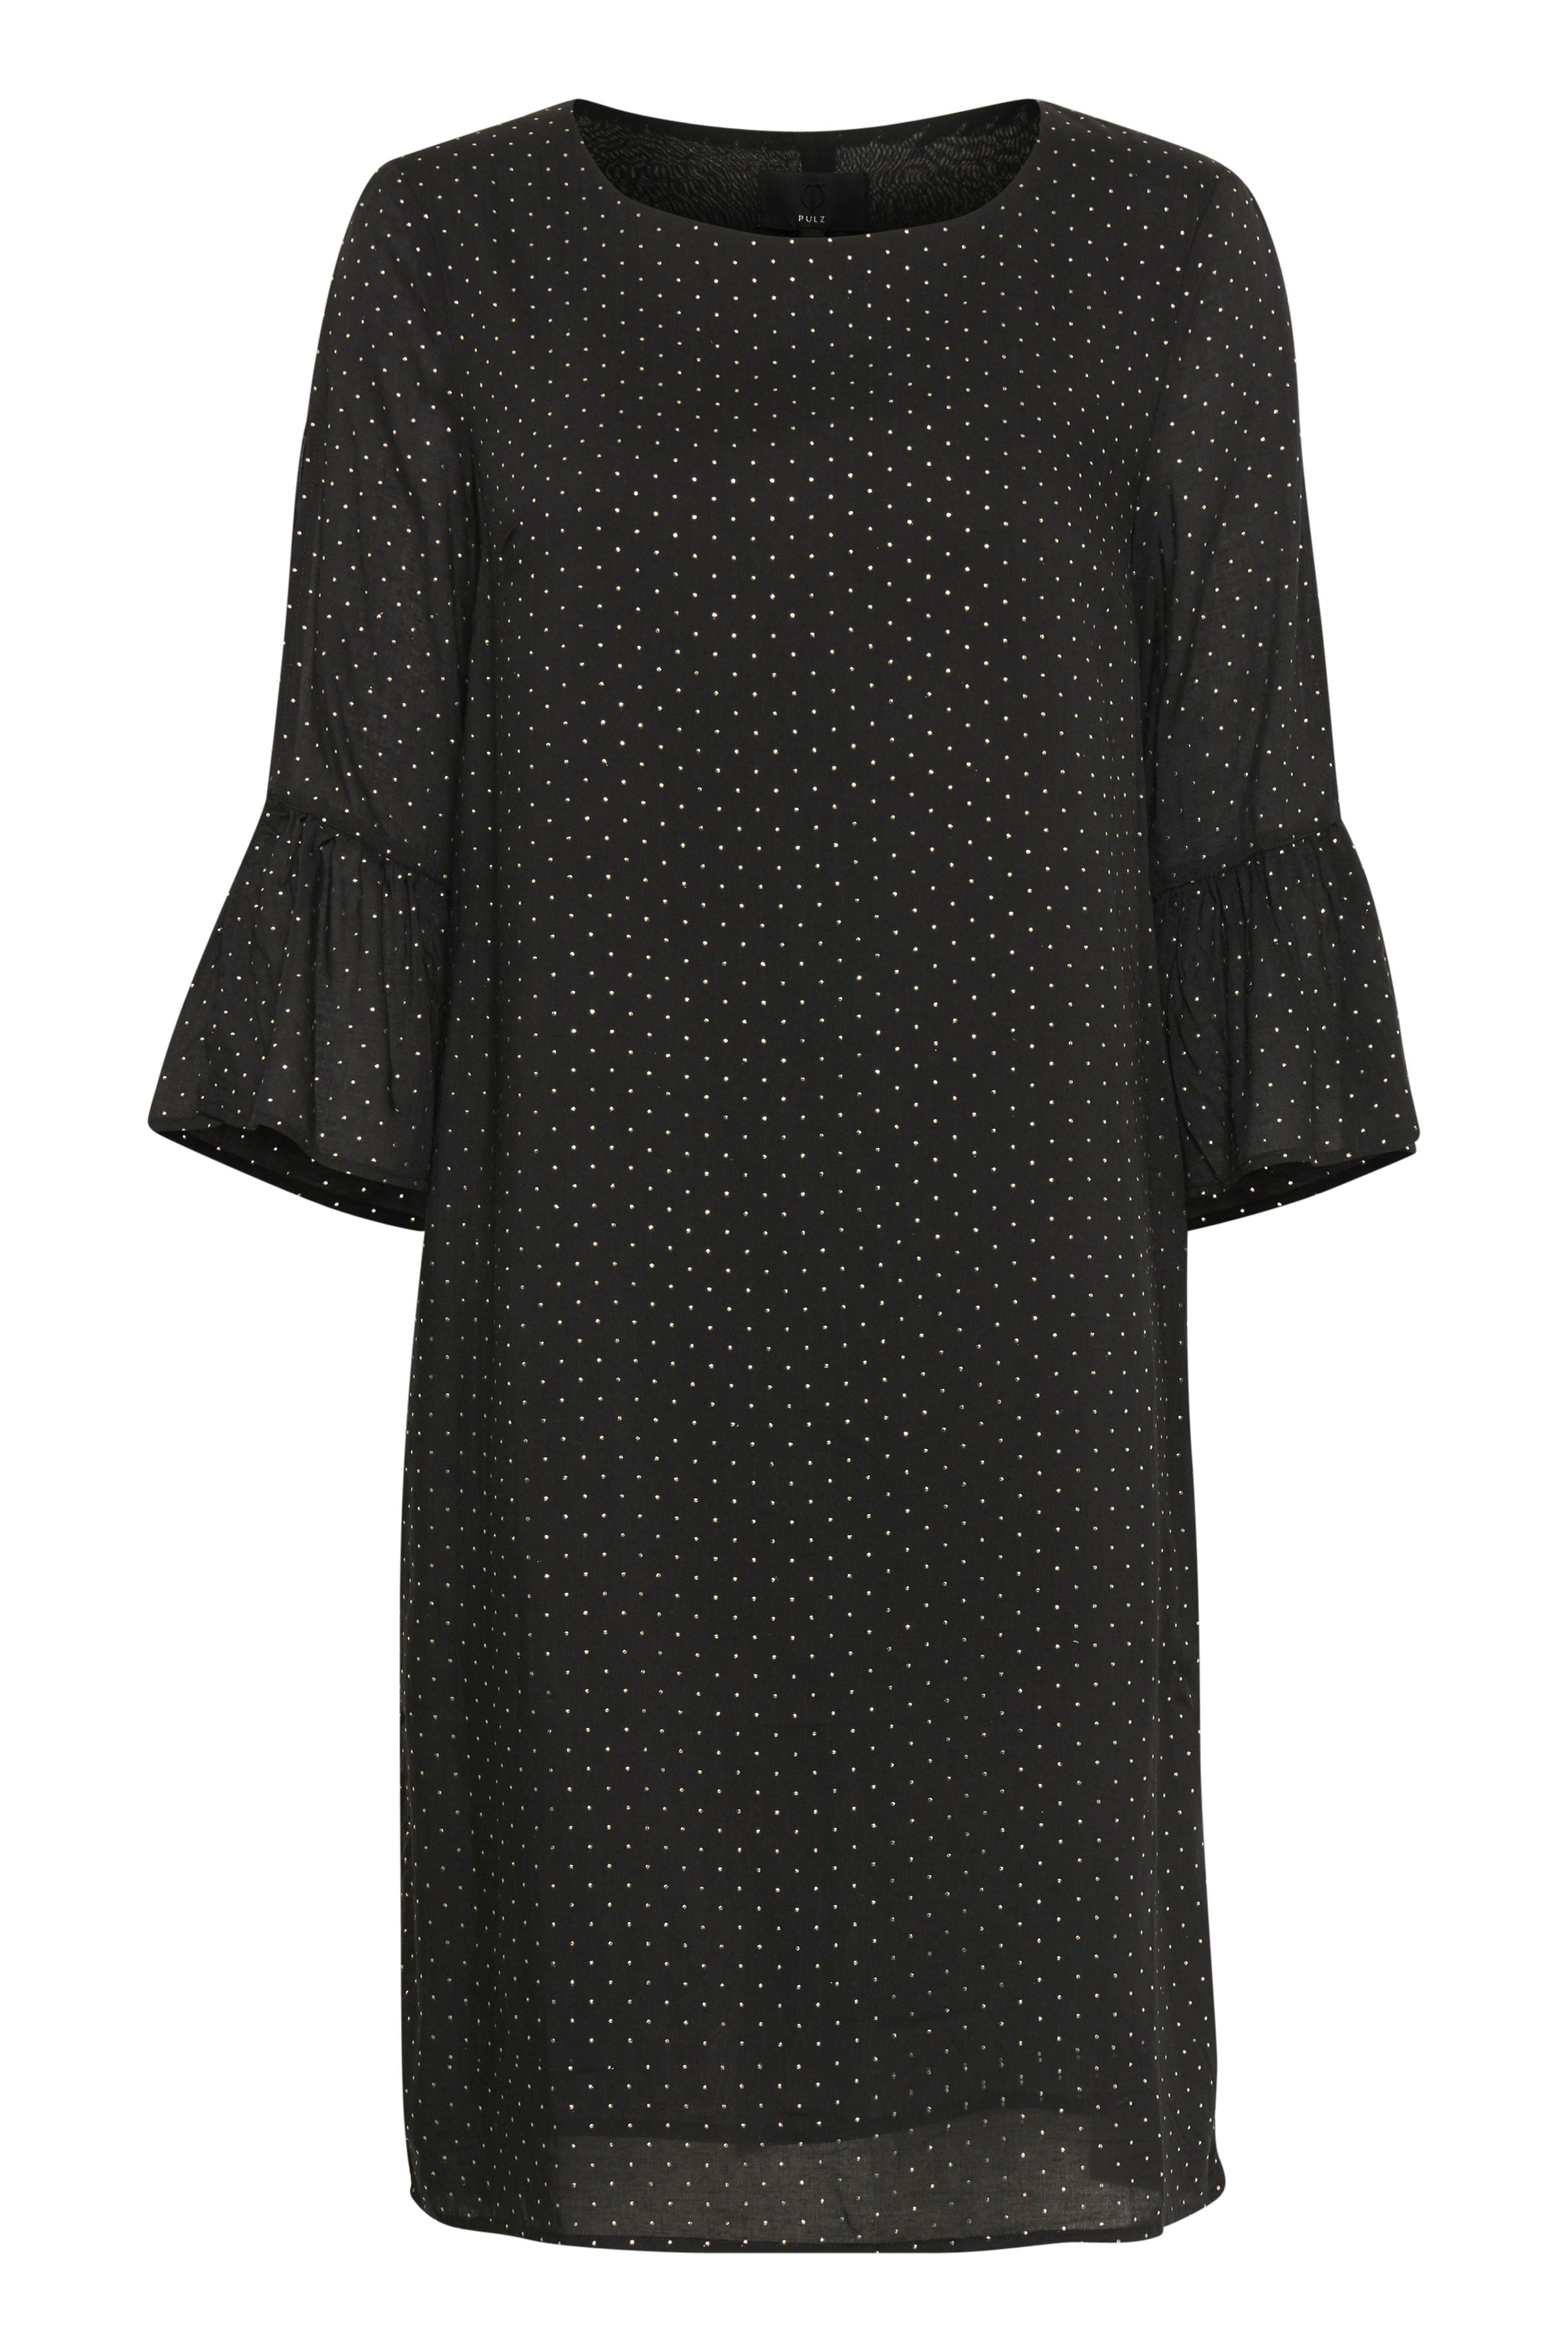 Black Kjole – Køb Black Kjole fra str. XS-XXL her